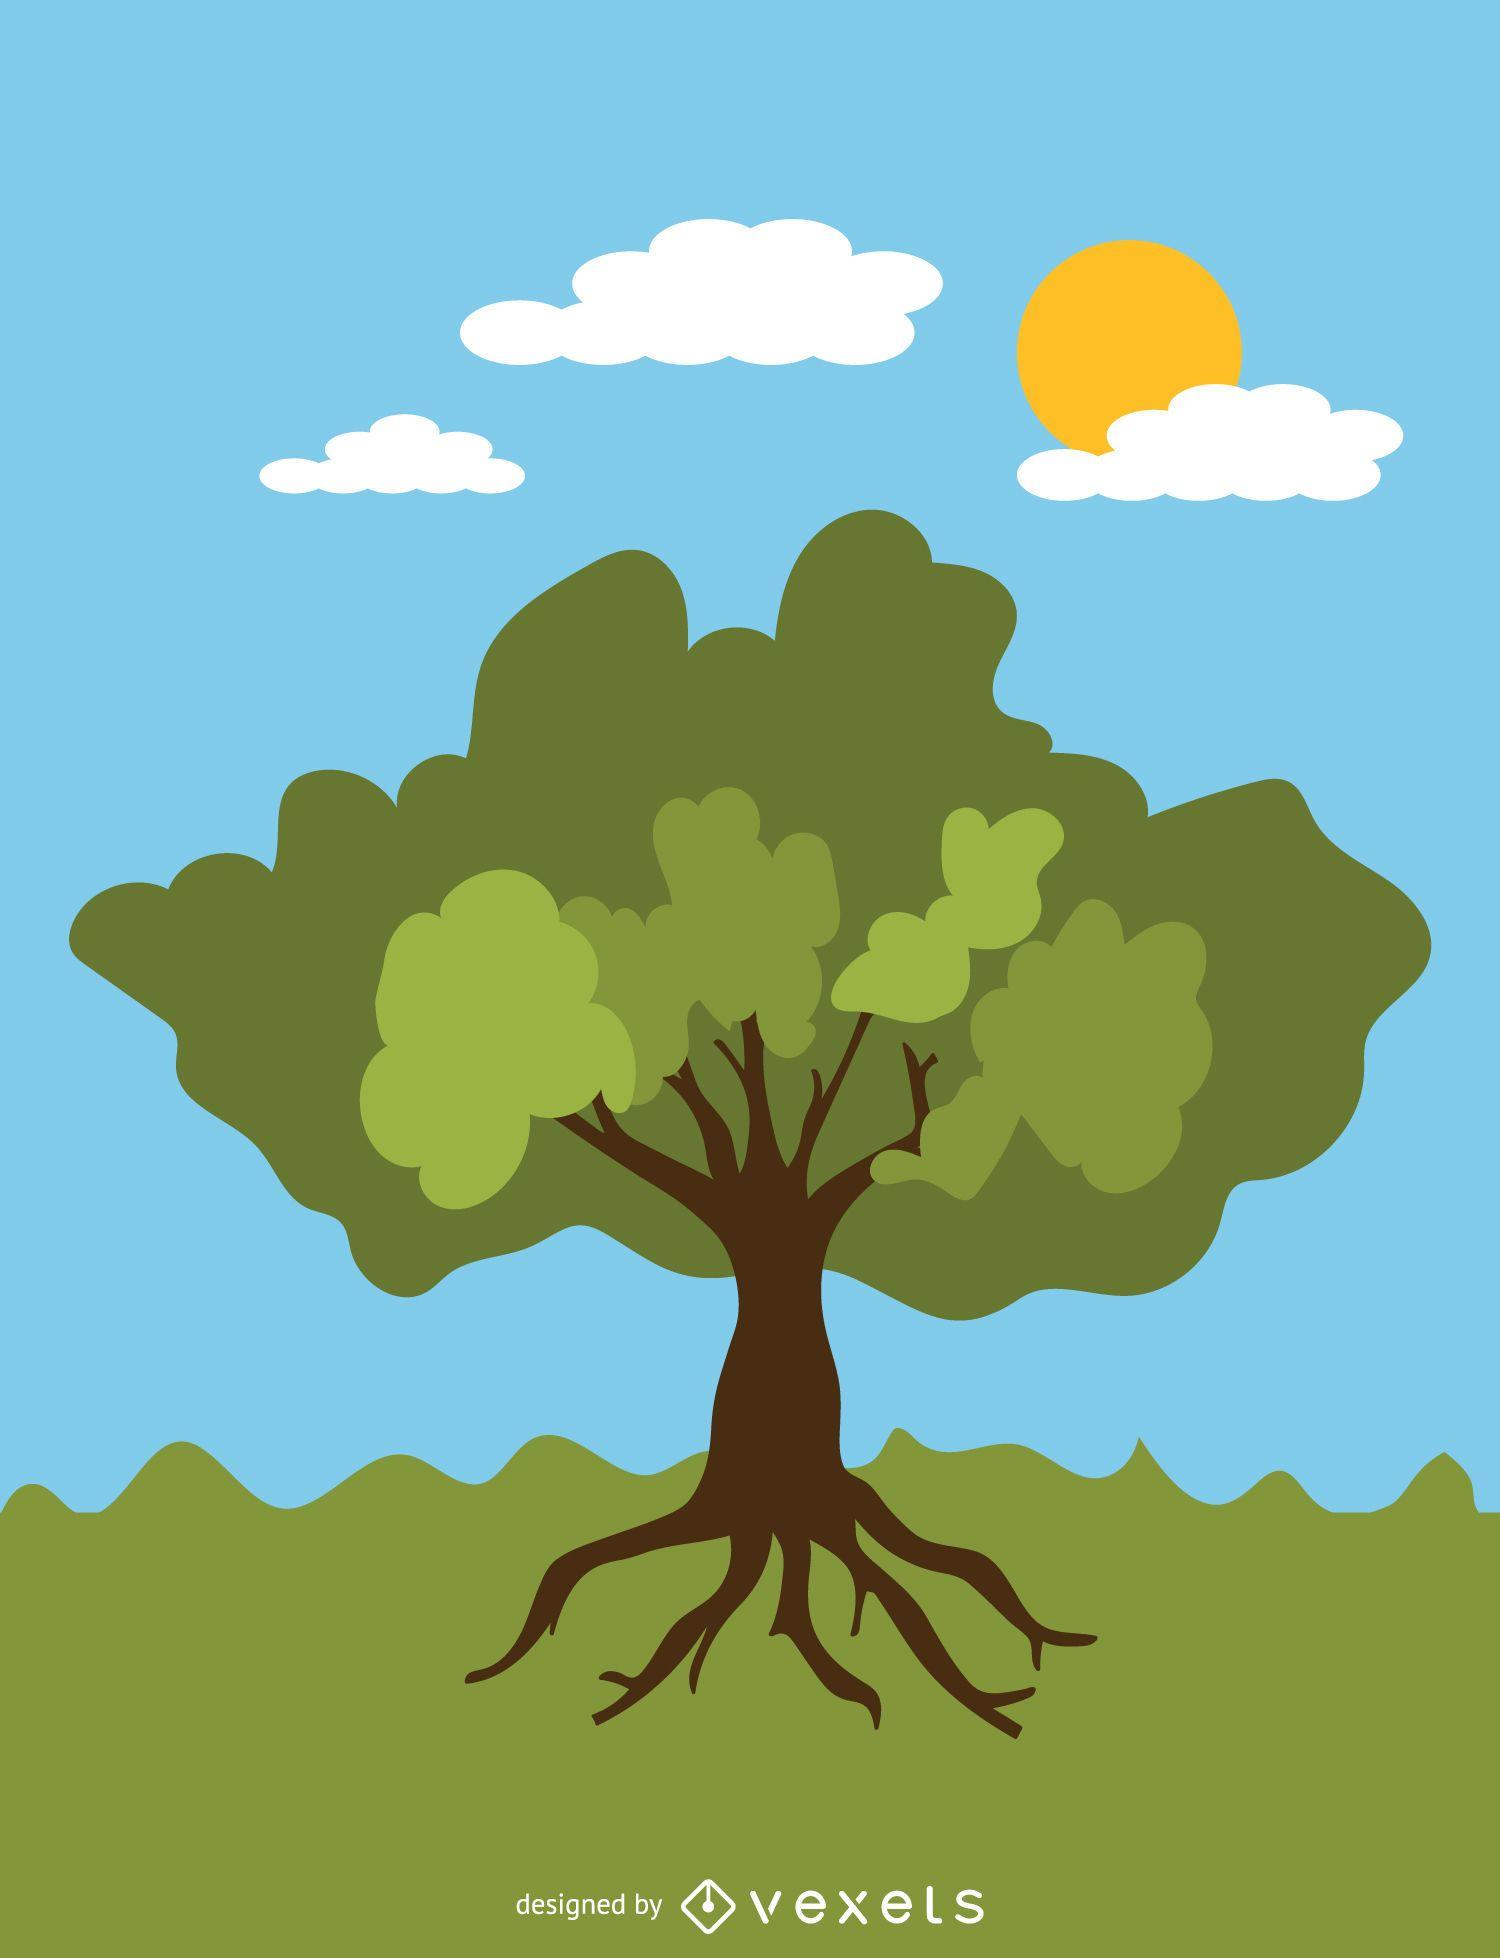 Leafy summer tree in cartoon style